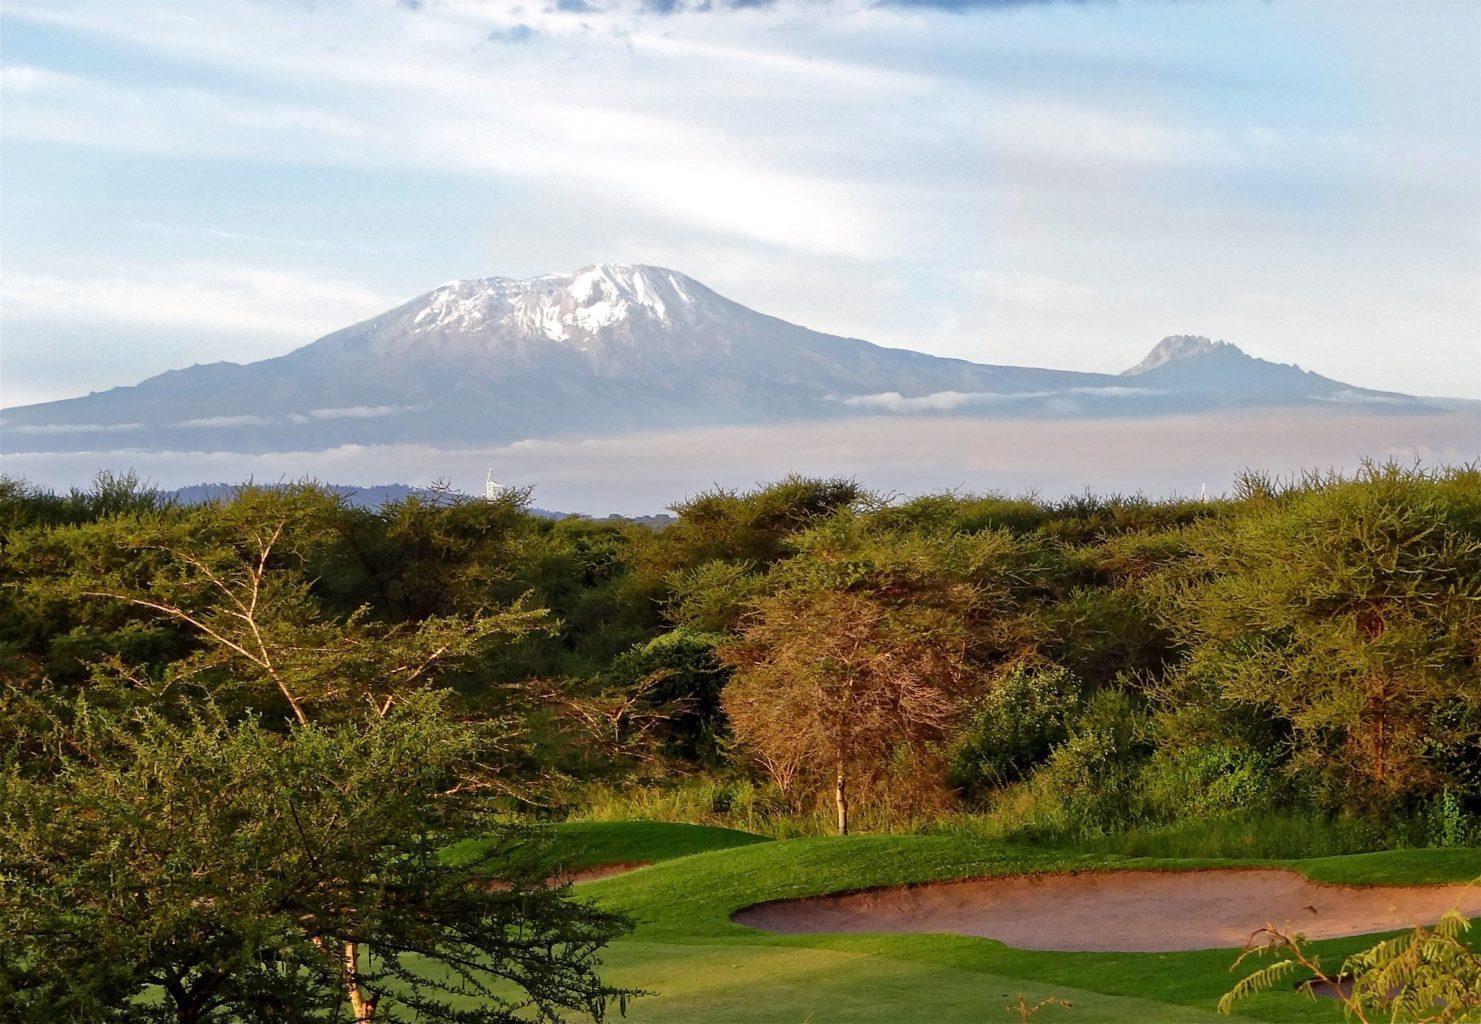 Kilimanjaro Golf Club